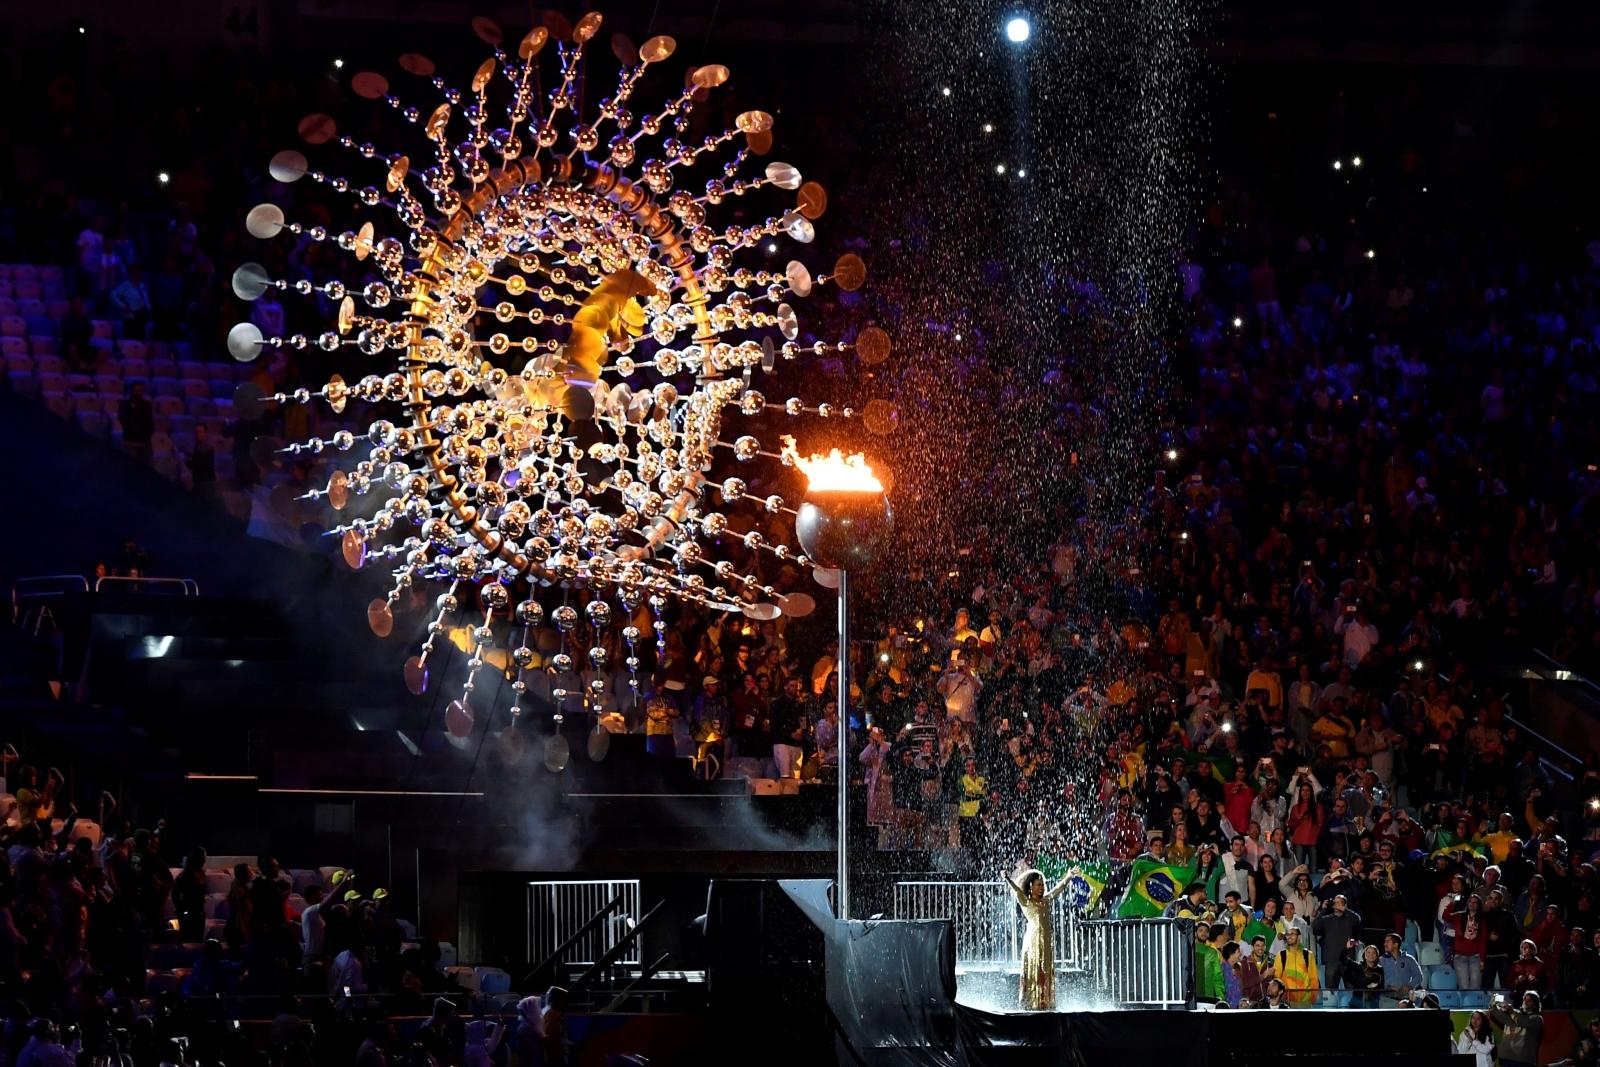 Rio 2016 Olympics: Closing ceremony highlights